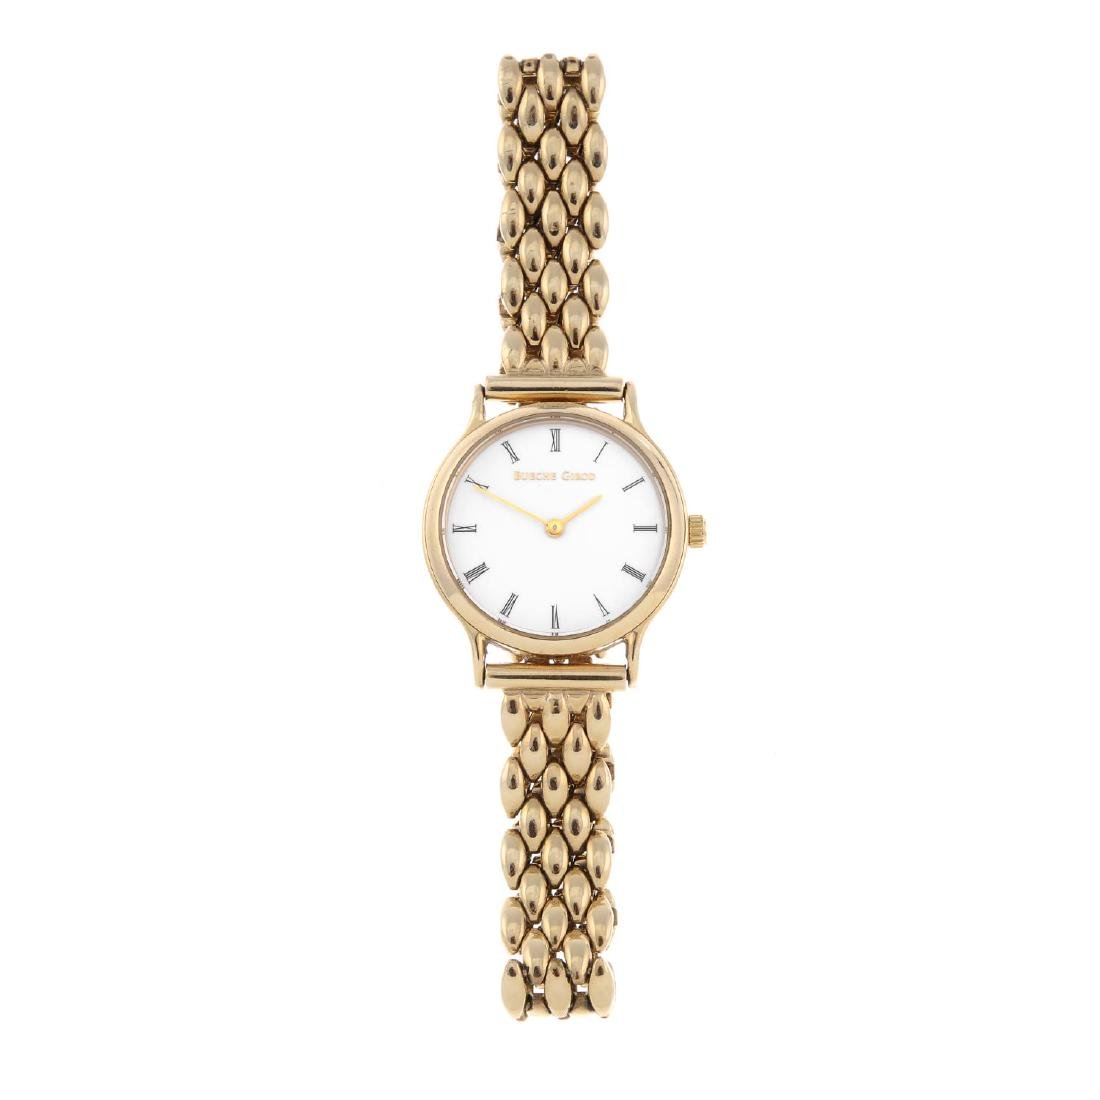 BUECHE GIROD - a lady's bracelet watch. Yellow metal